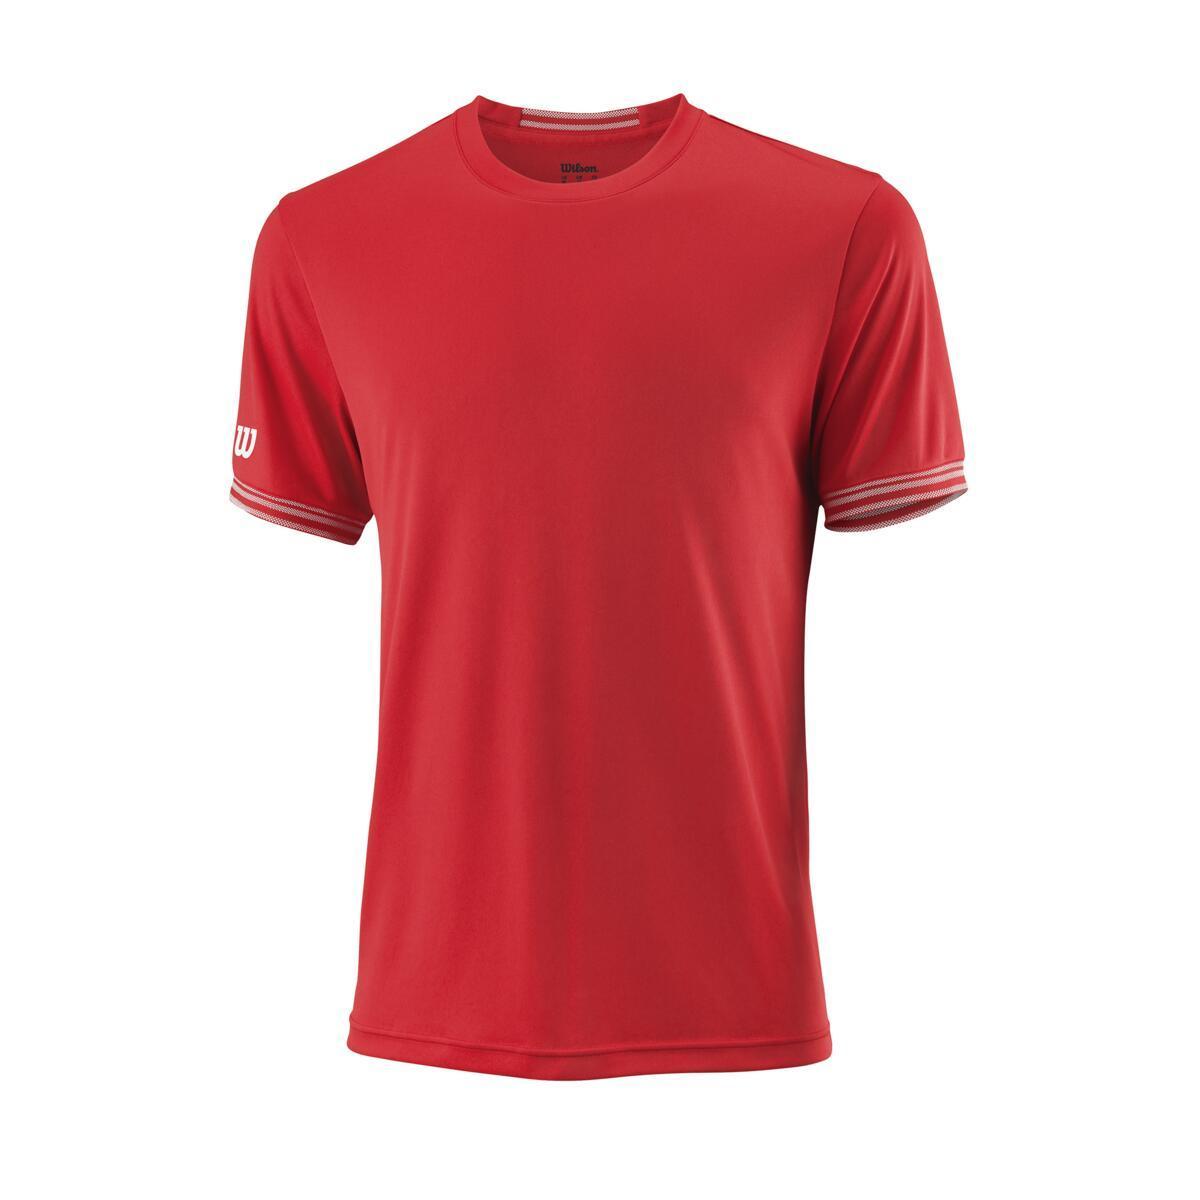 Camiseta Wilson Solid roja